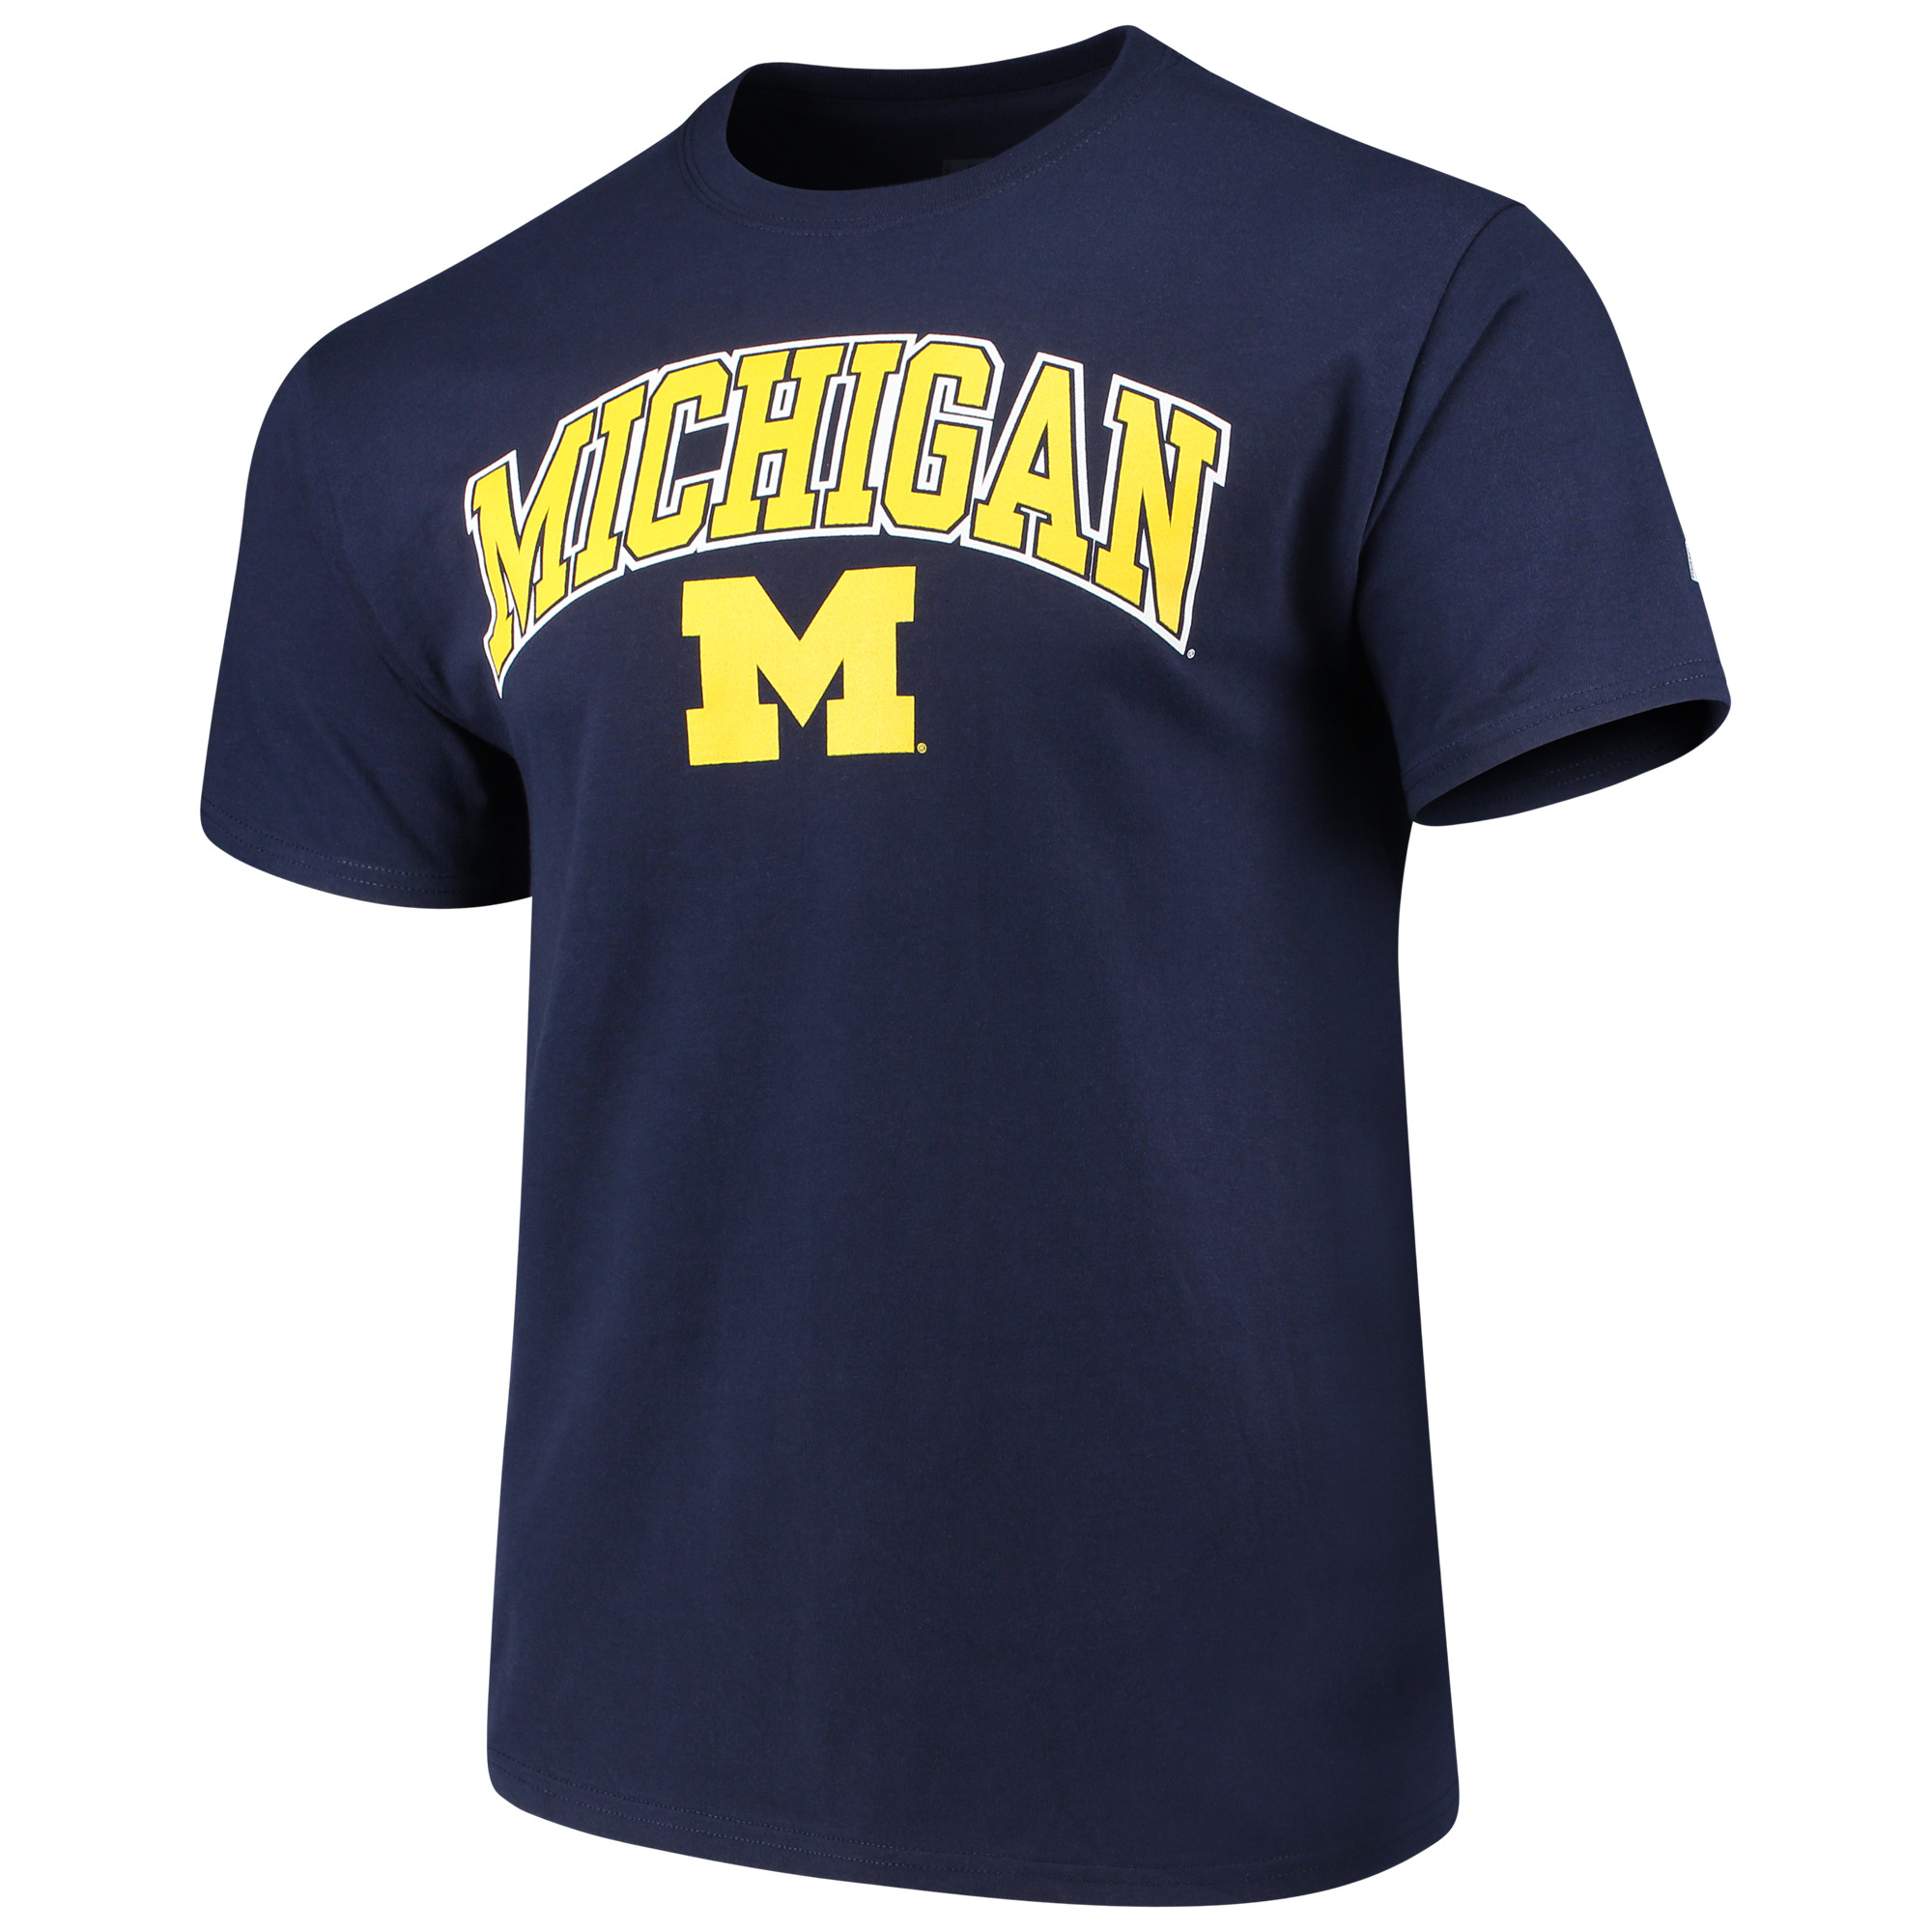 Men's Russell Navy Michigan Wolverines Crew Core Print T-Shirt